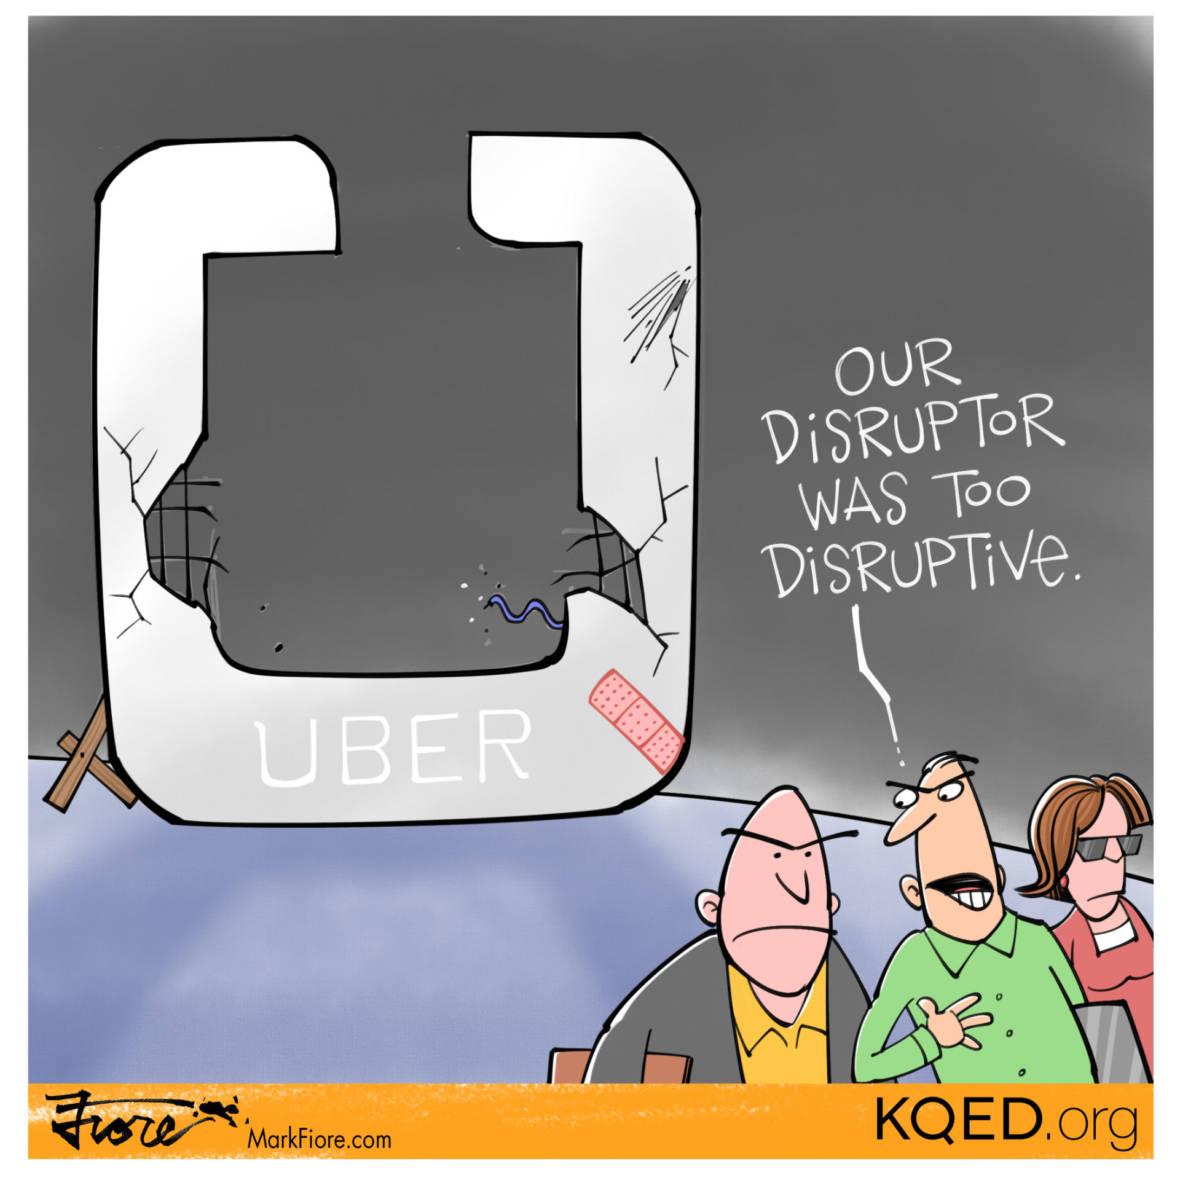 Uber's Disruptive Disruptor Resigns